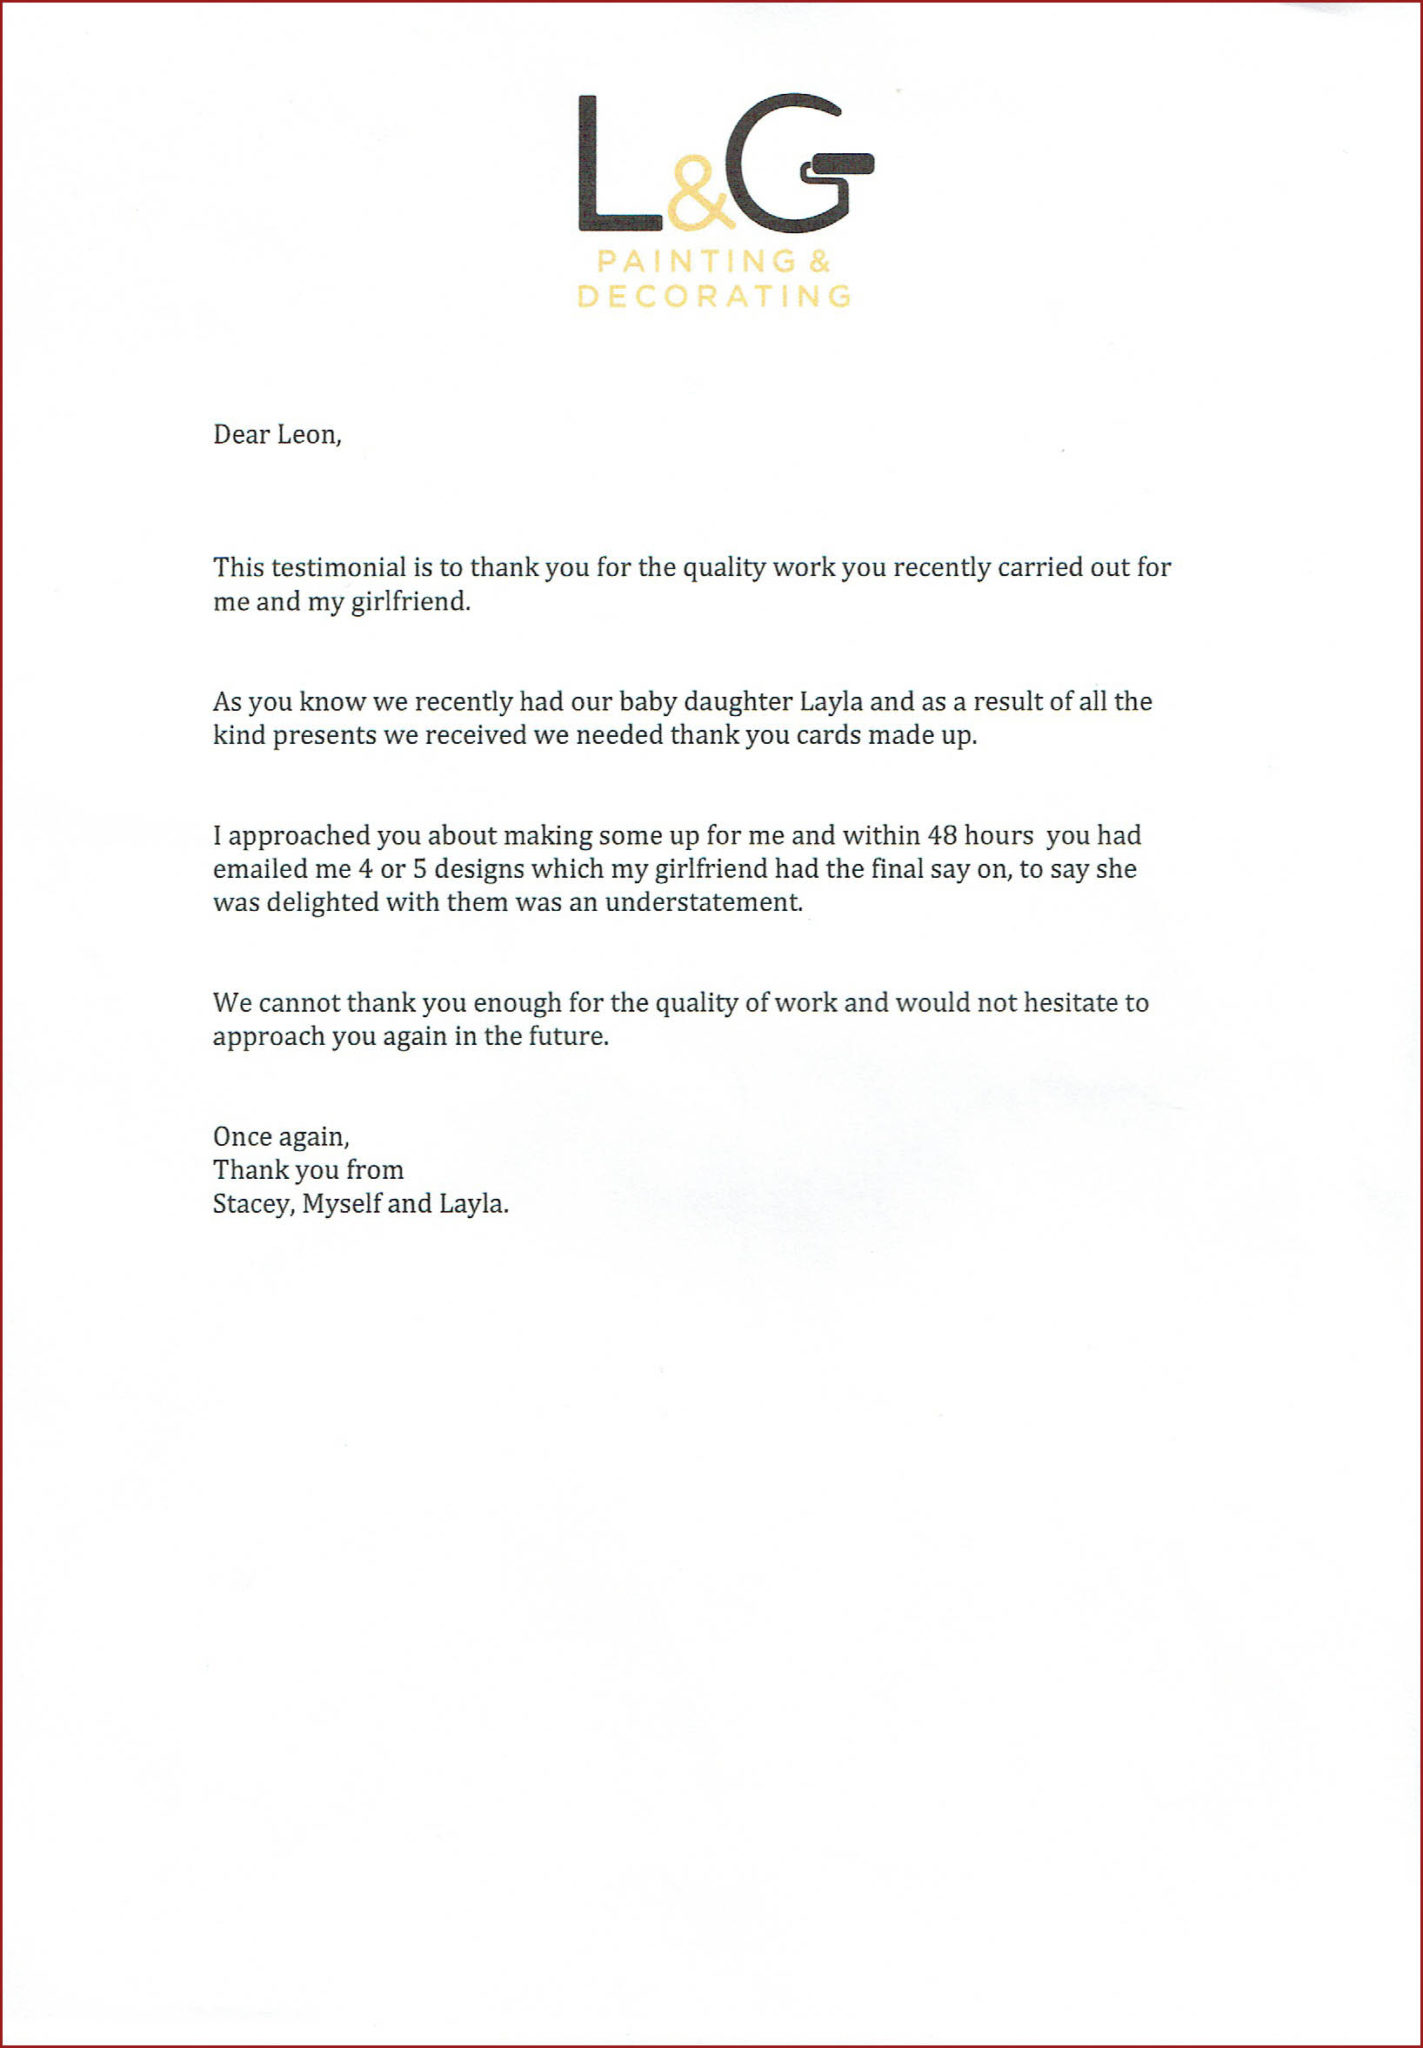 L&G, customer testimonial